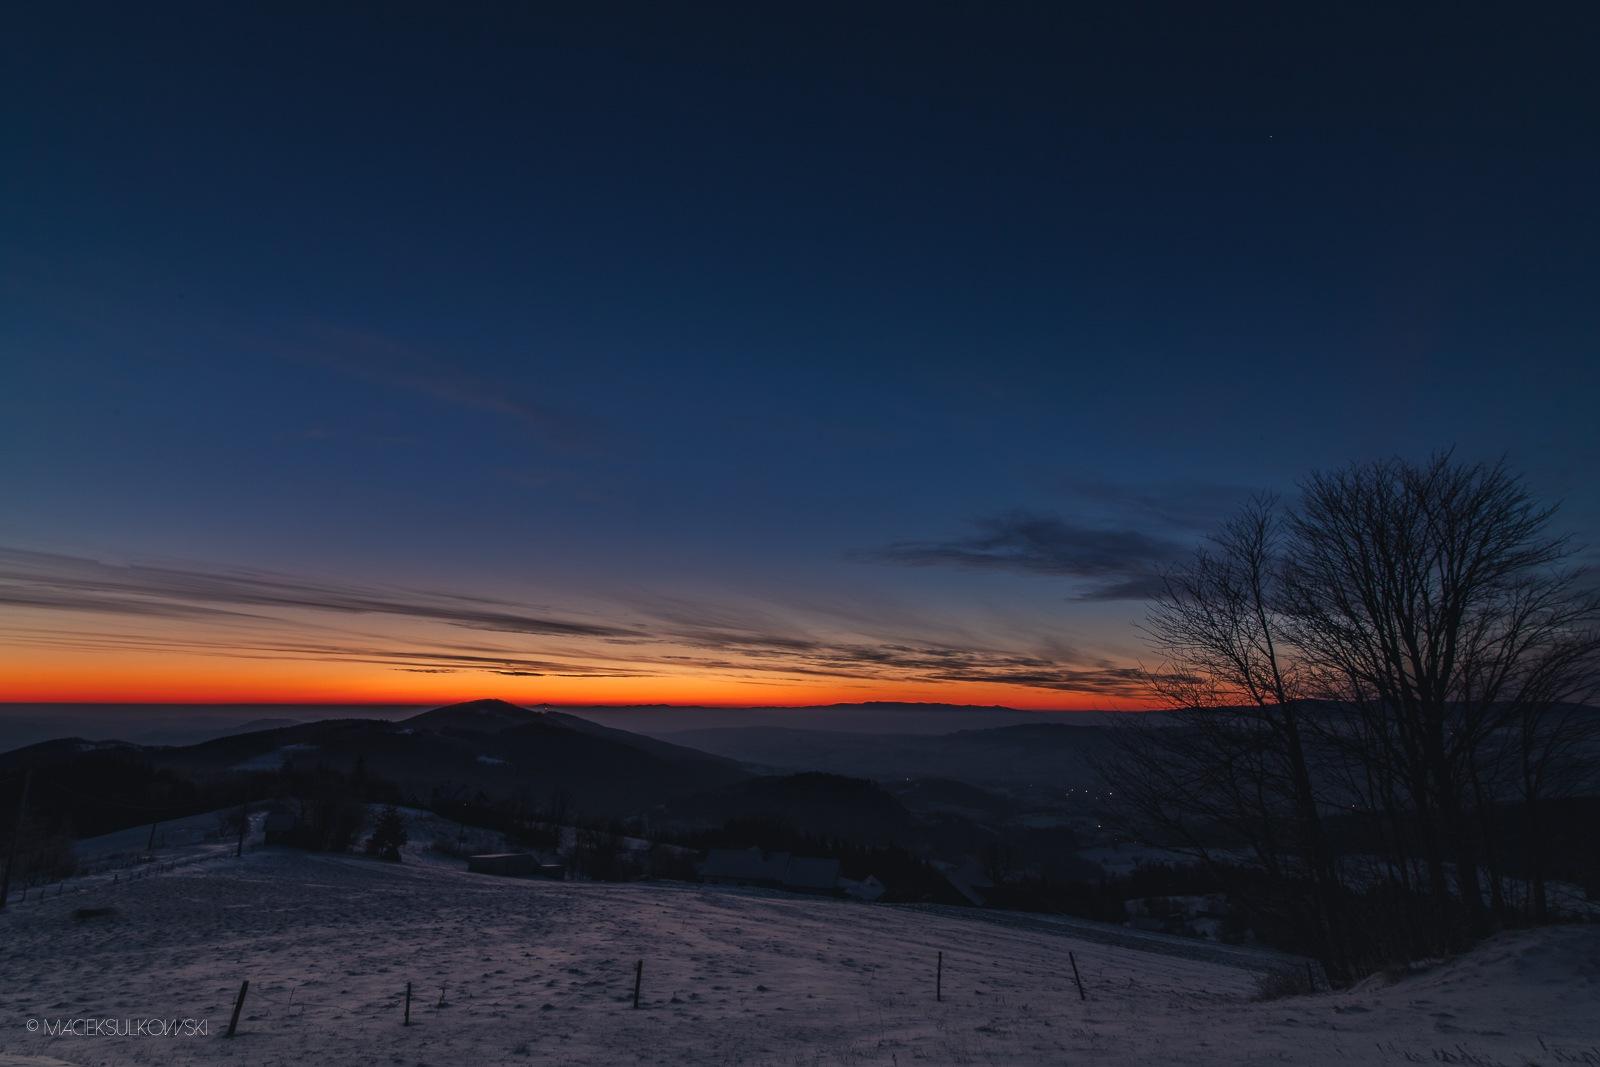 First light... by Maciek Sulkowski